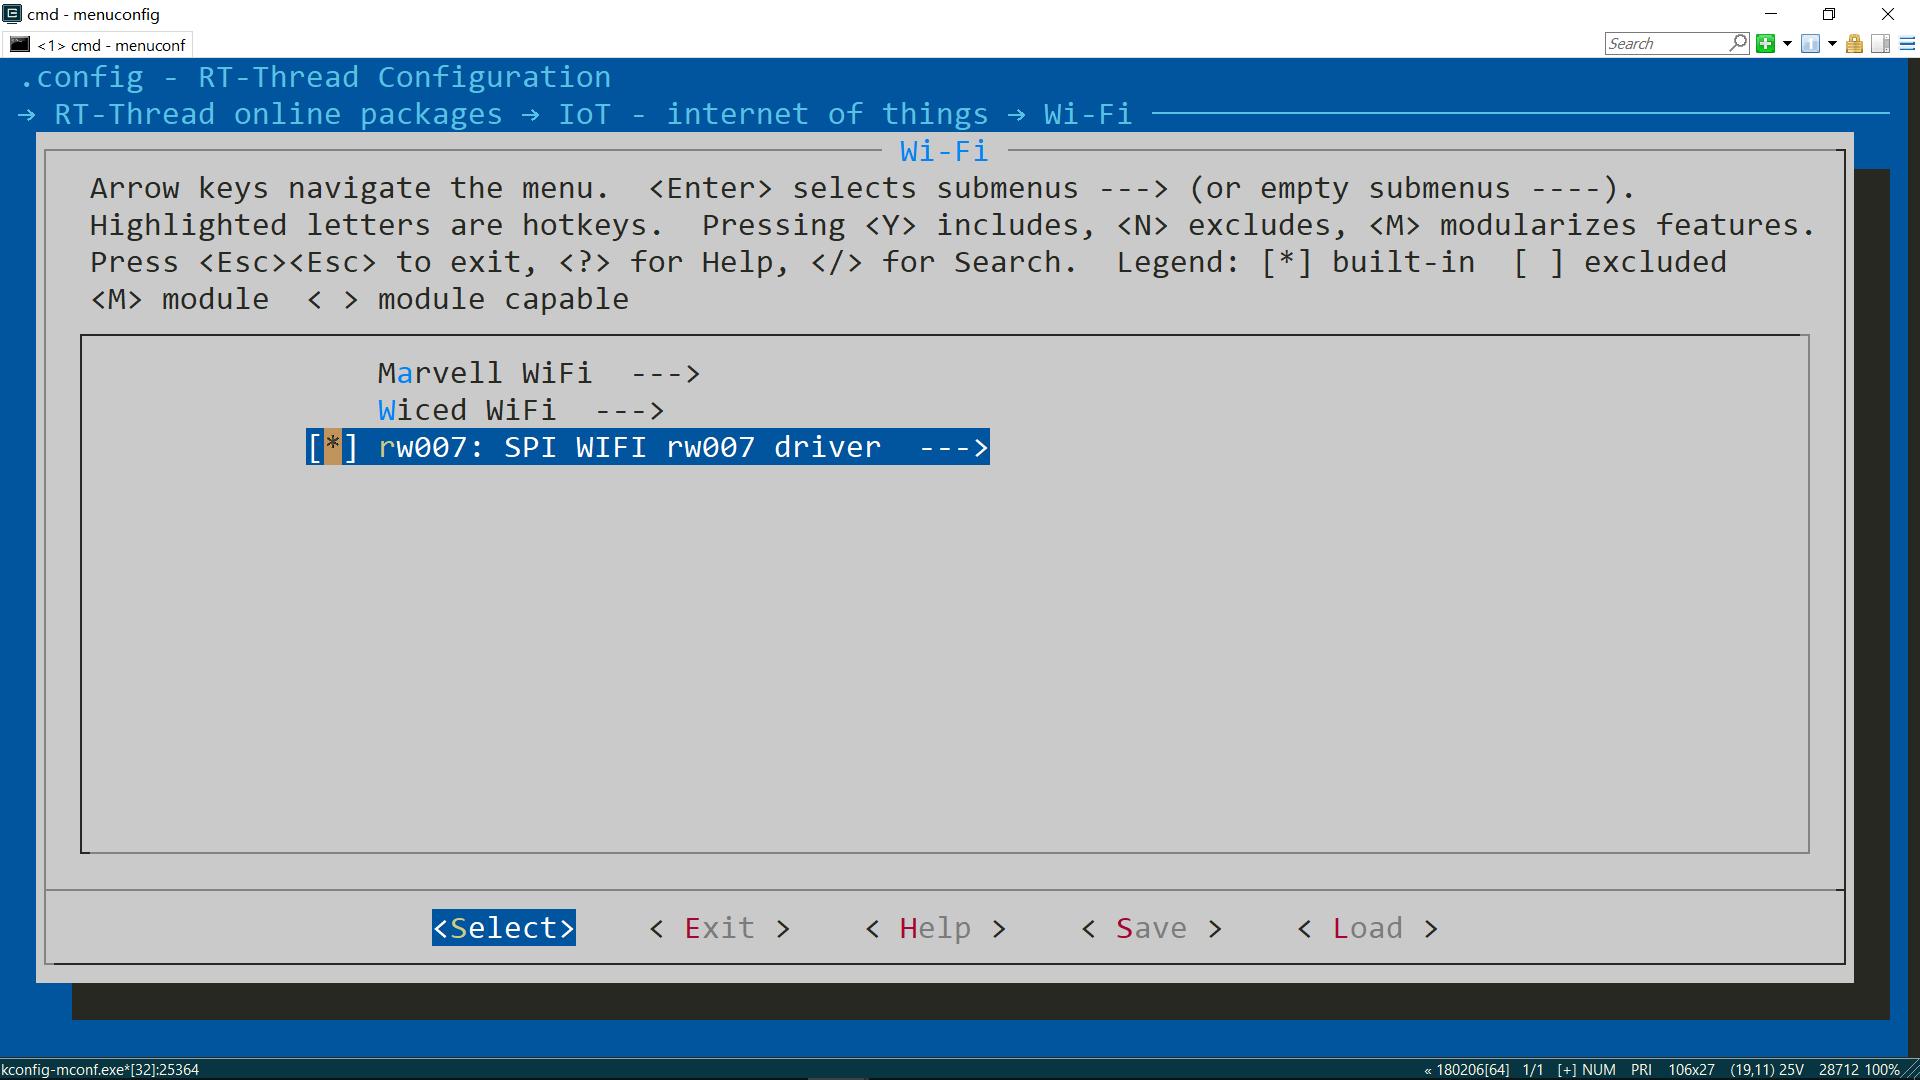 图11 使用 RW007 软件包